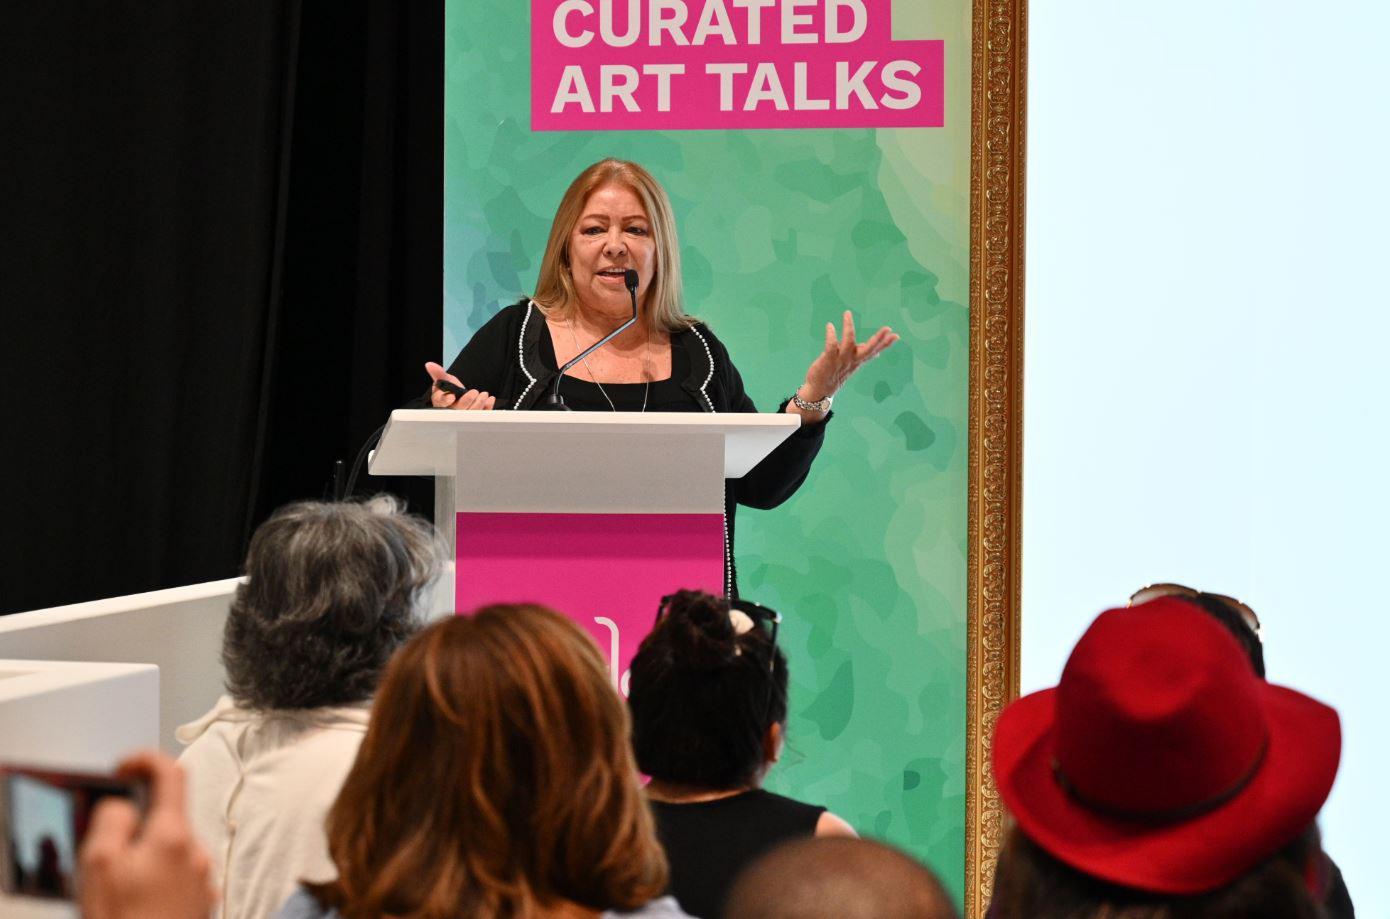 Curated Art Talks